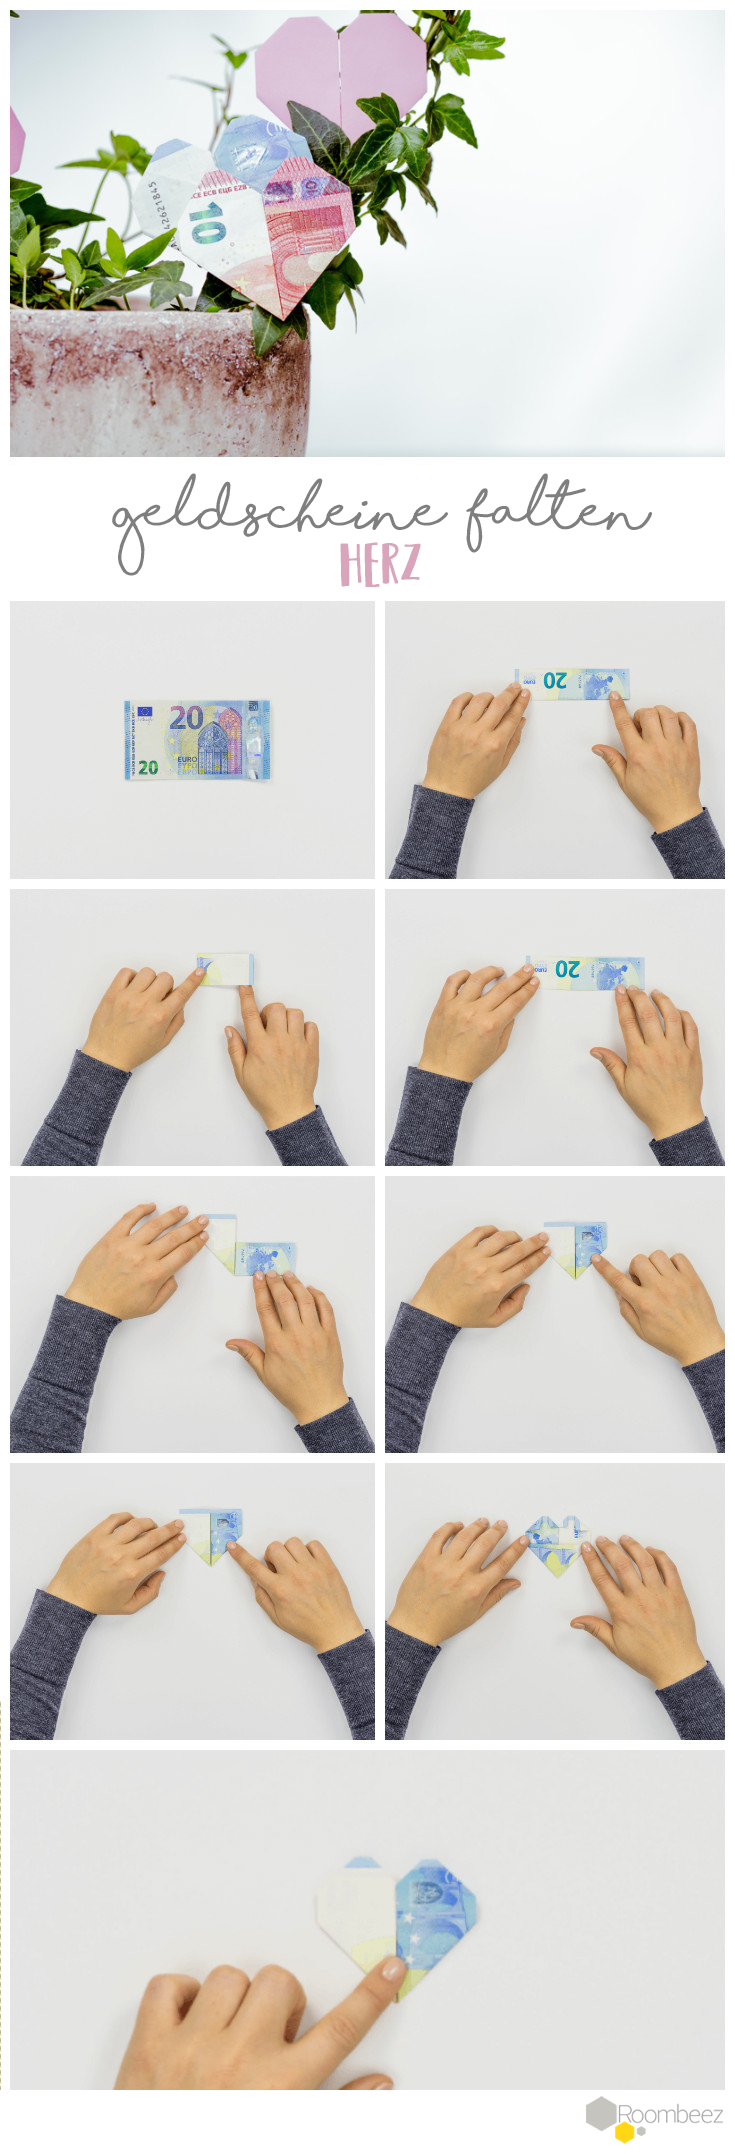 Geldscheine Falten 10 Falttechniken Schritt Fur Schritt Erklart